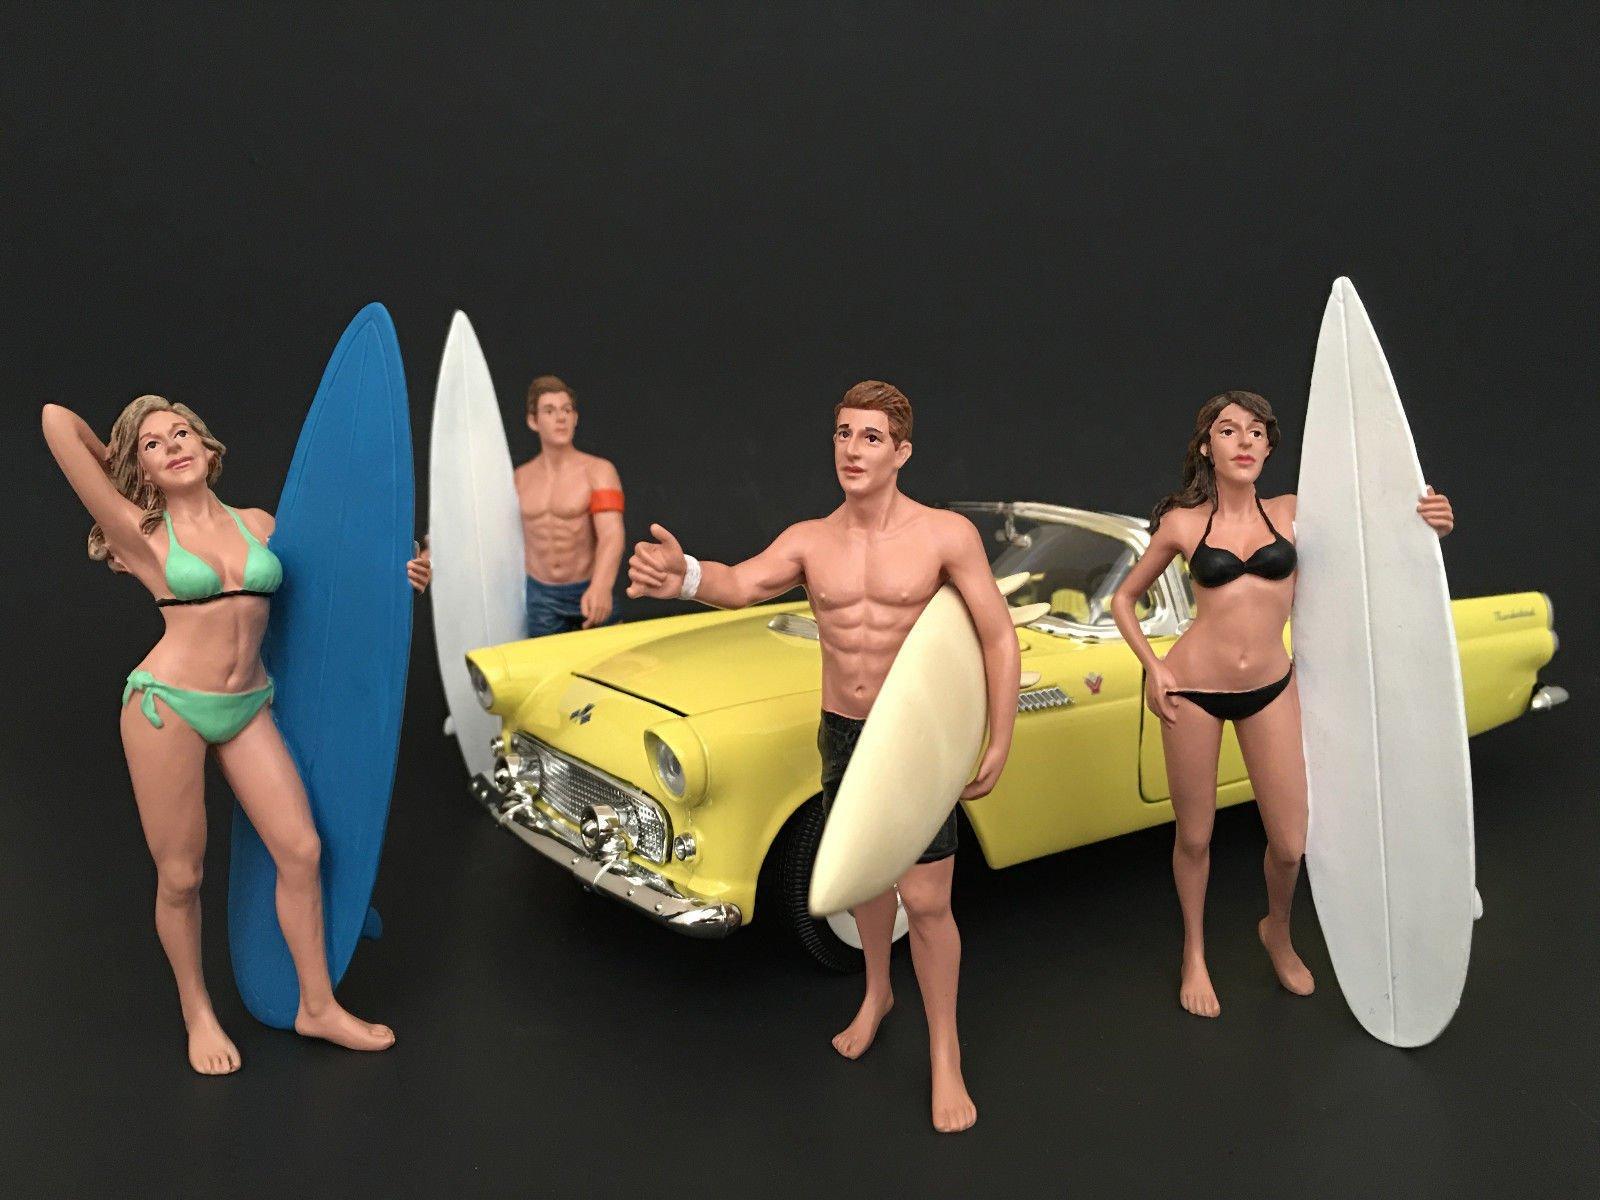 NEW 1:18 AMERICAN DIORAMA FIGURE - SURFER Set Of 4 - Vehicle Figure By American Diorama AD-77439,77440,77441,77442